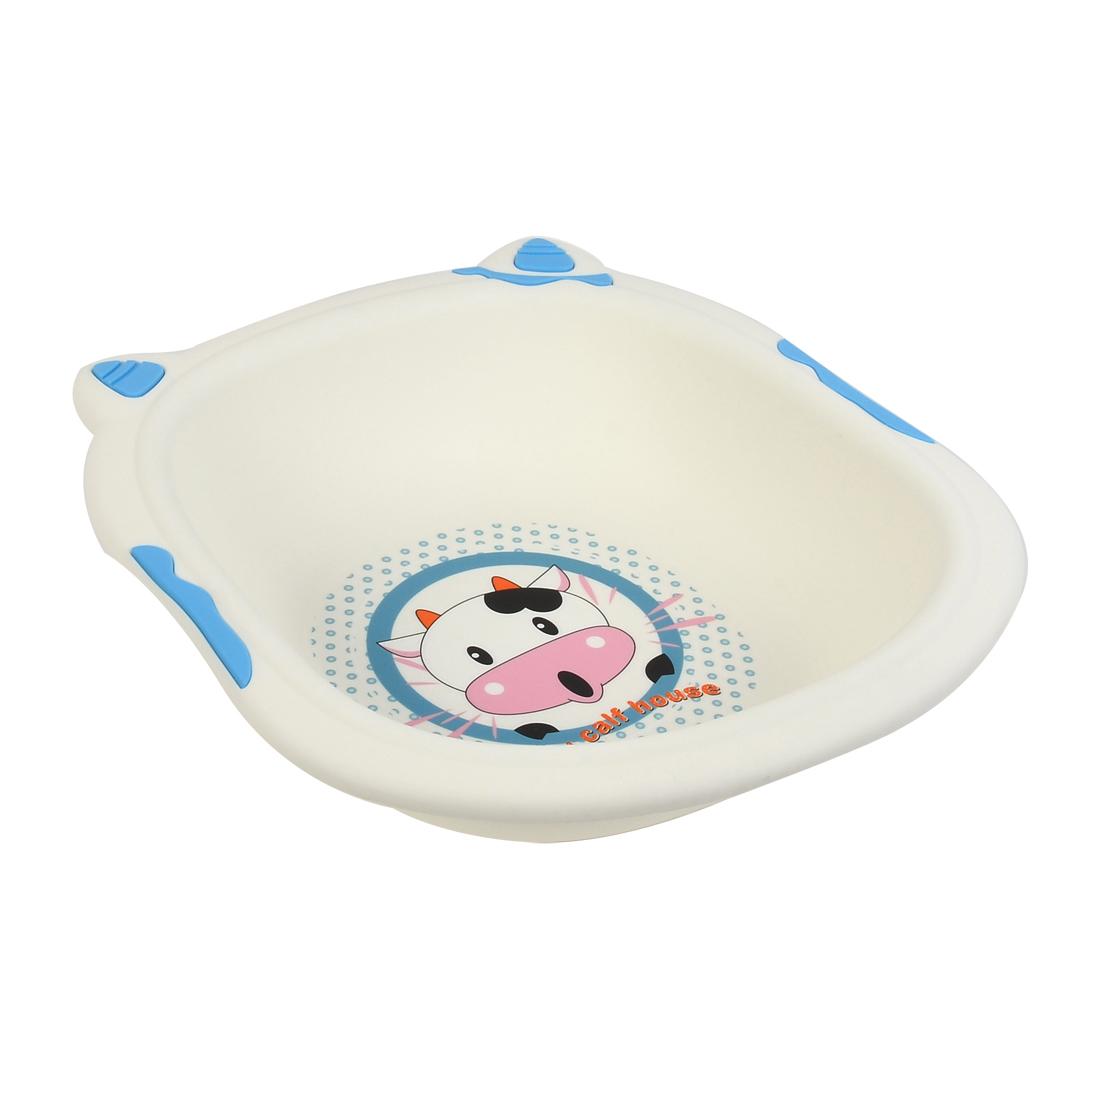 Plastic Cartoon Cow Pattern Washing Basin Cleaning Bowl 36cm x 34cm x 8cm Blue